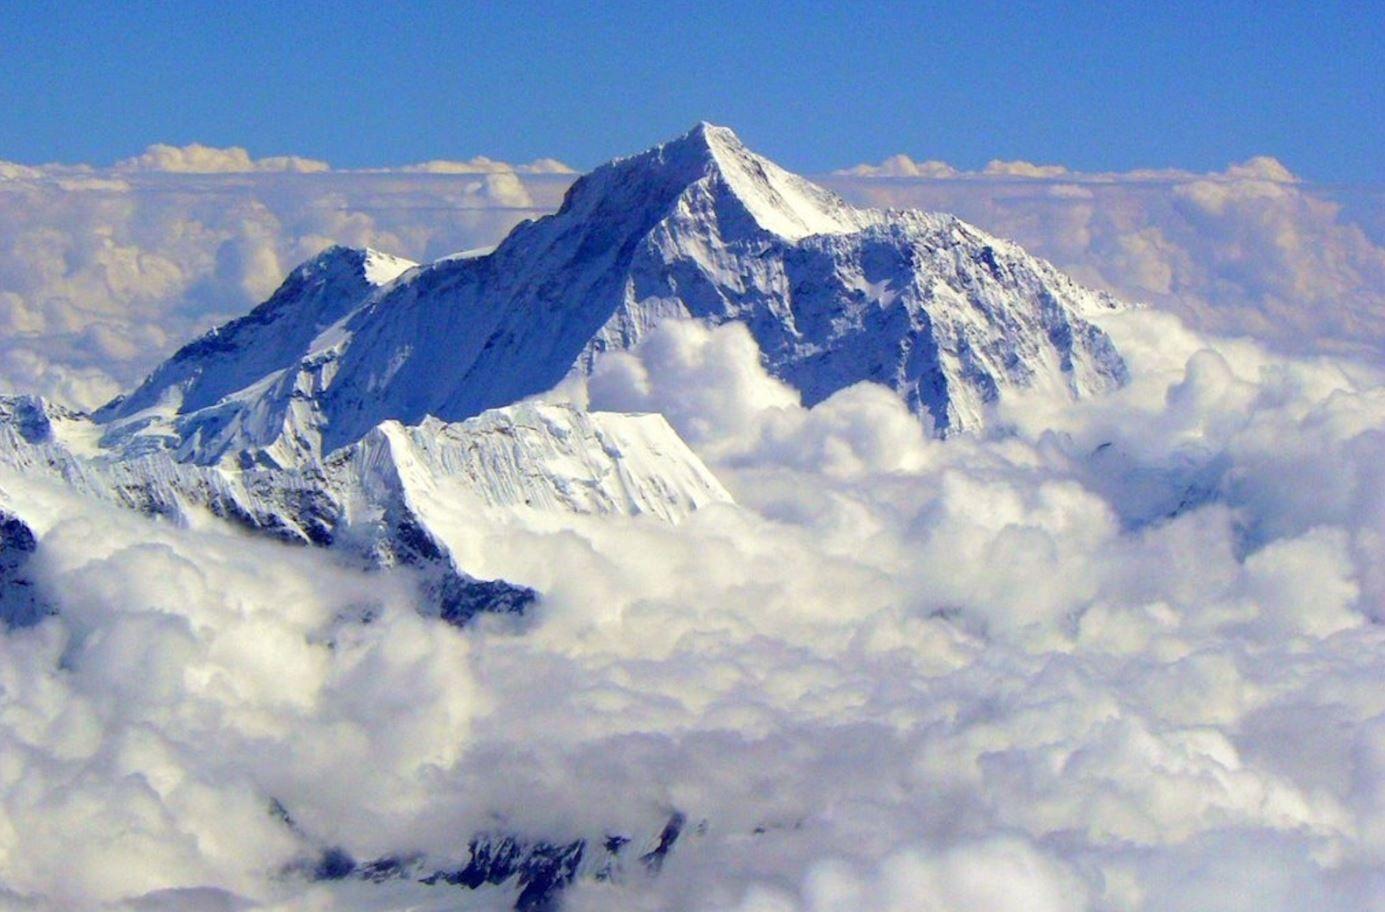 grande image montagne